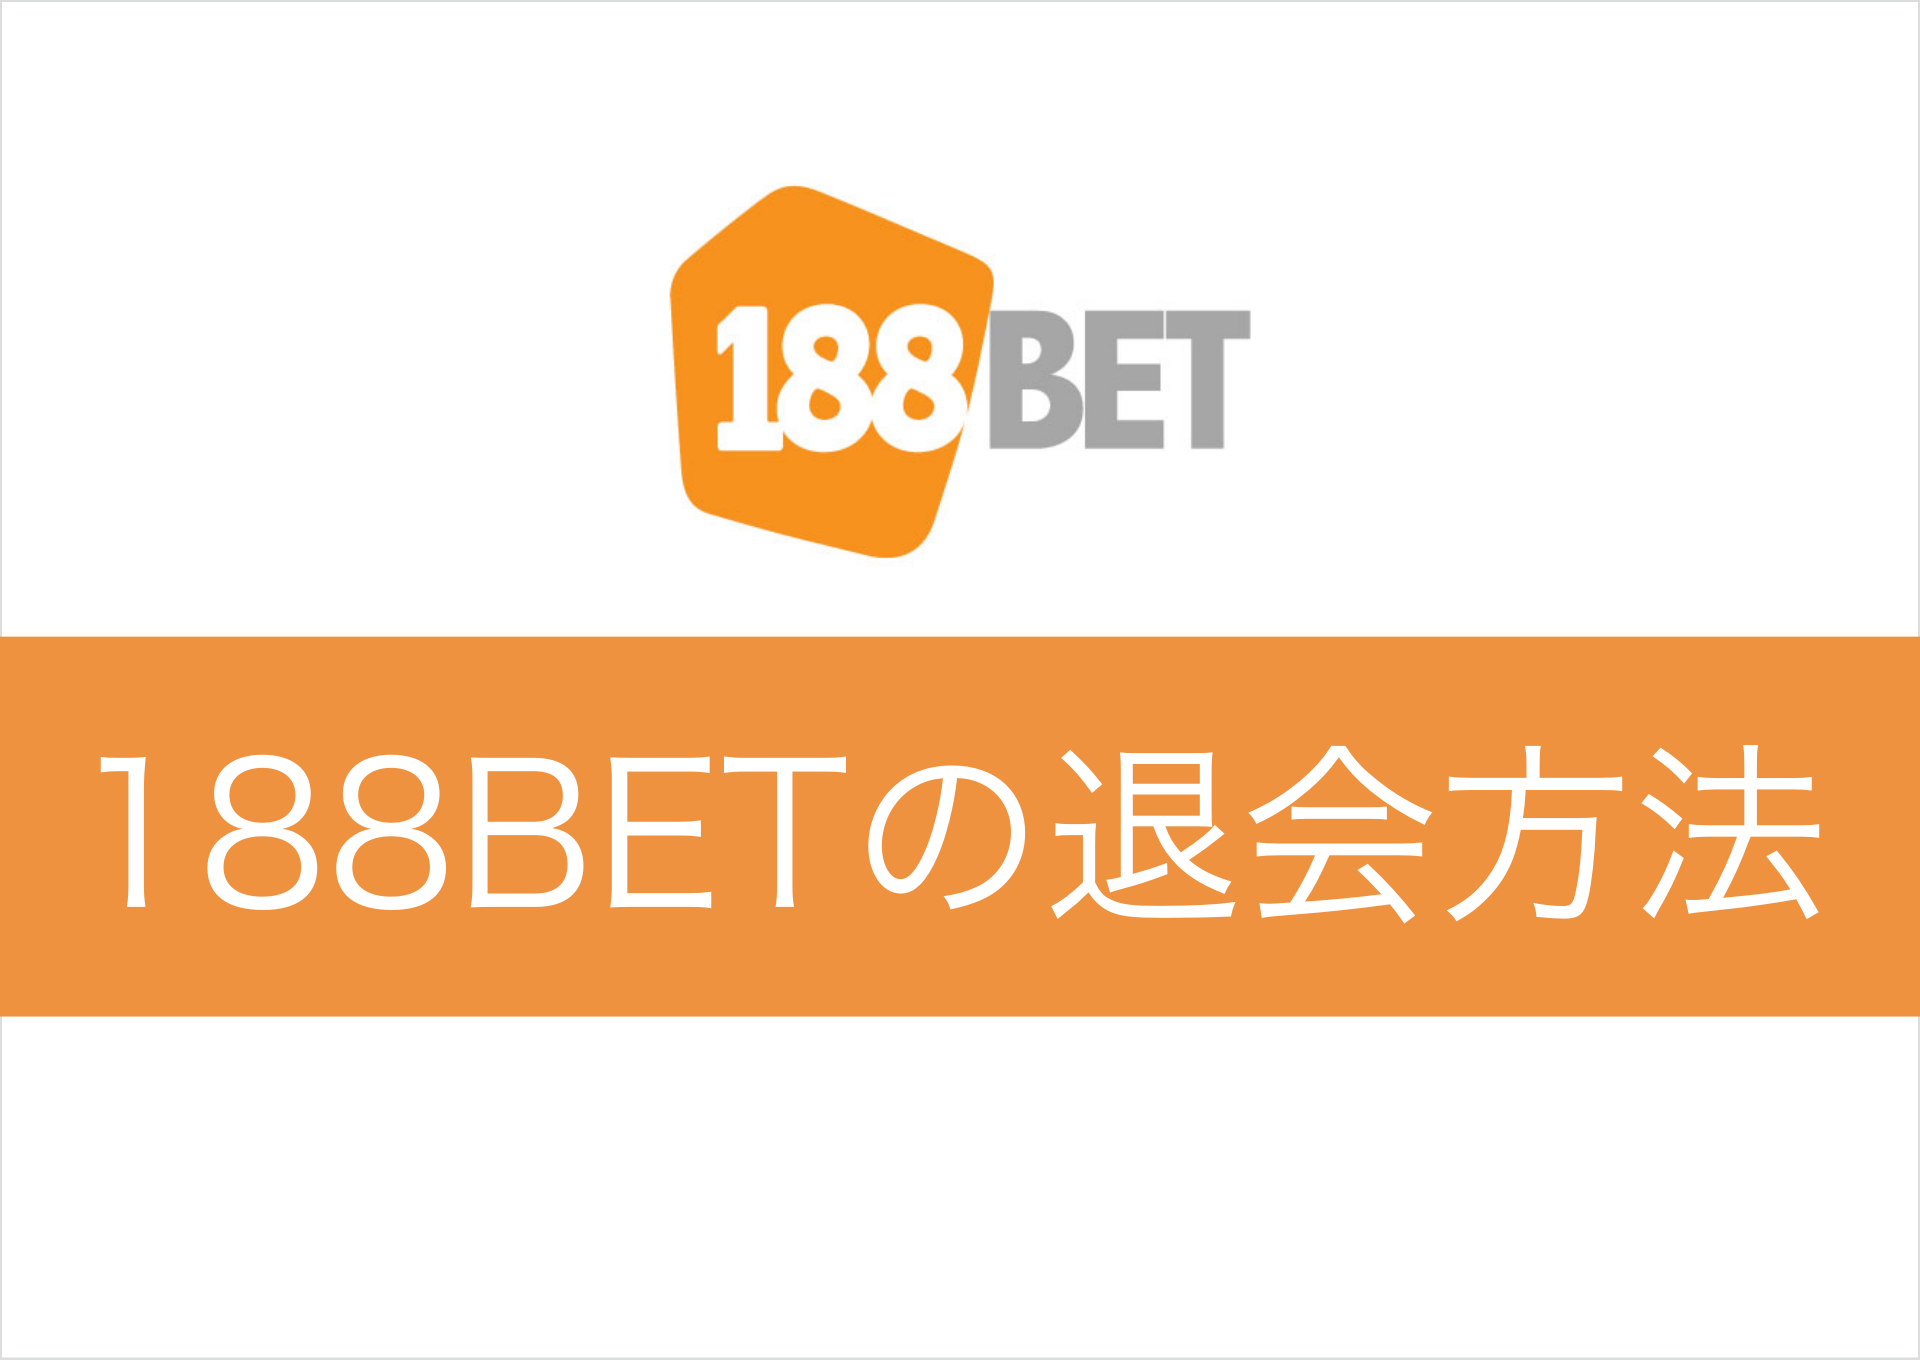 188BETの退会方法【残った資金は寄付される】